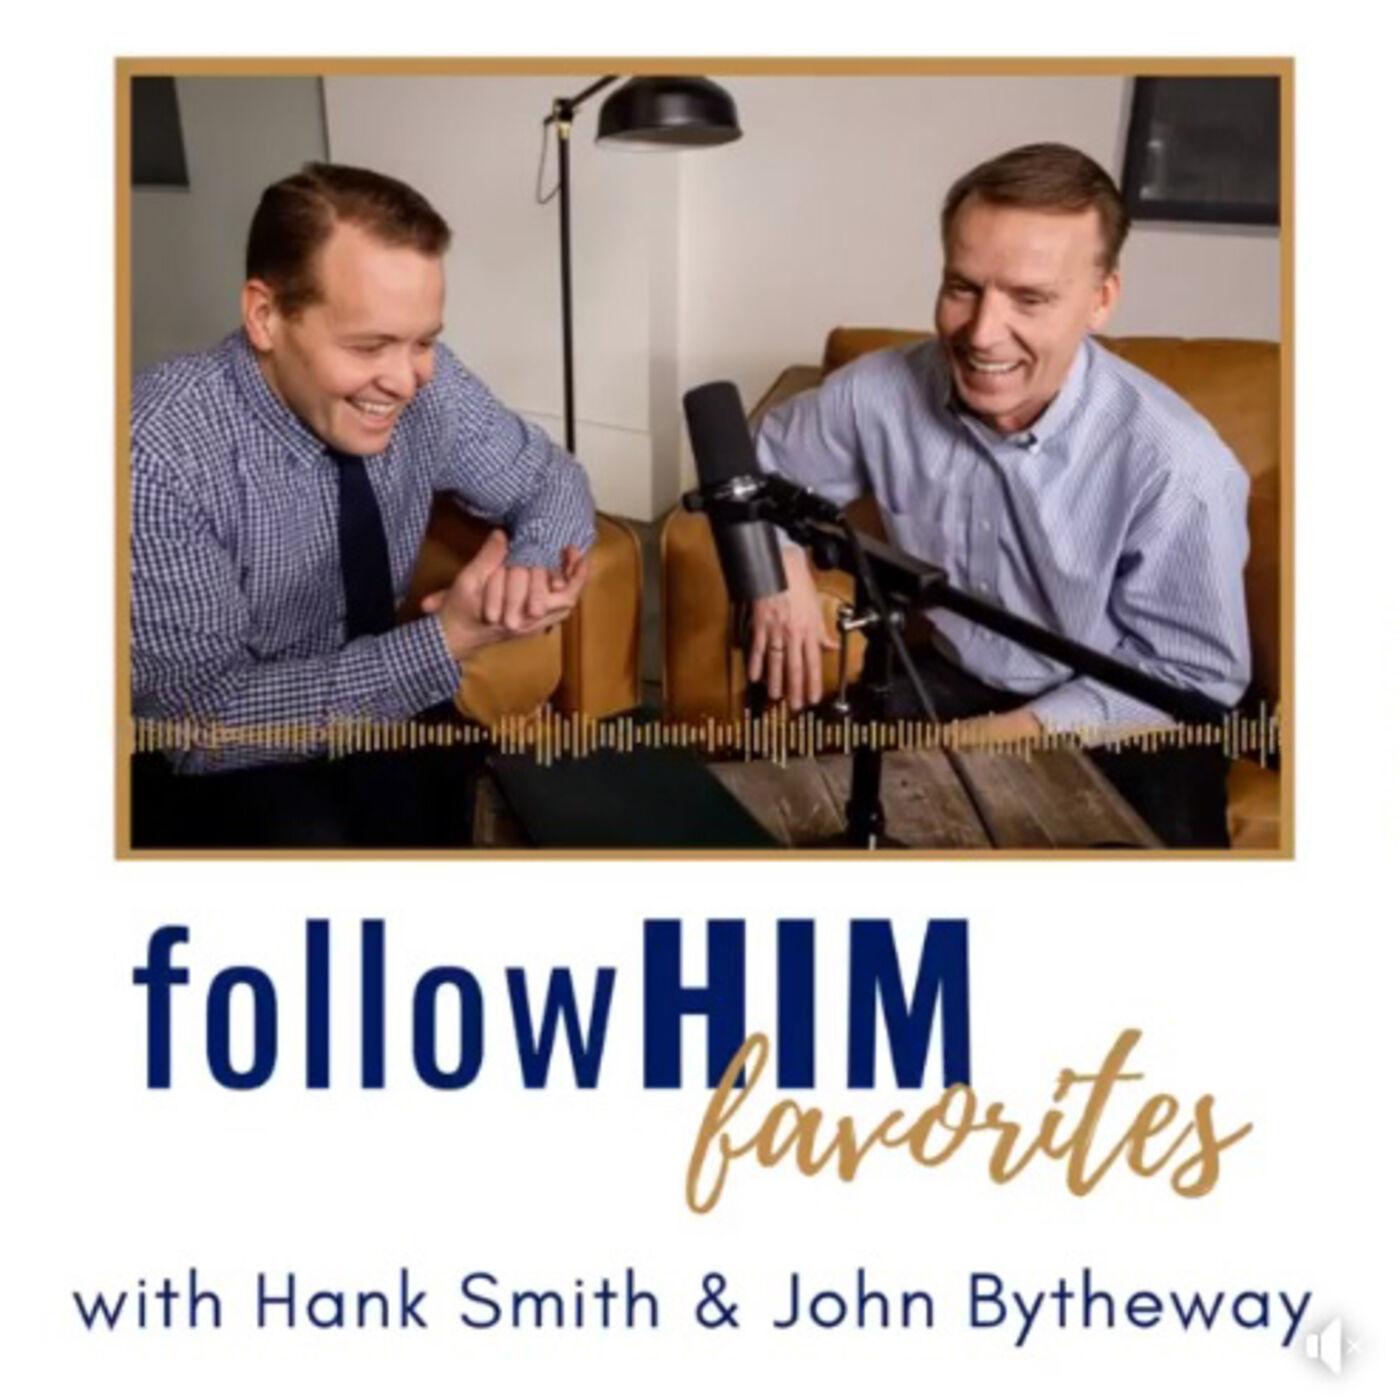 Doctrine & Covenants 45 : follow HIM...